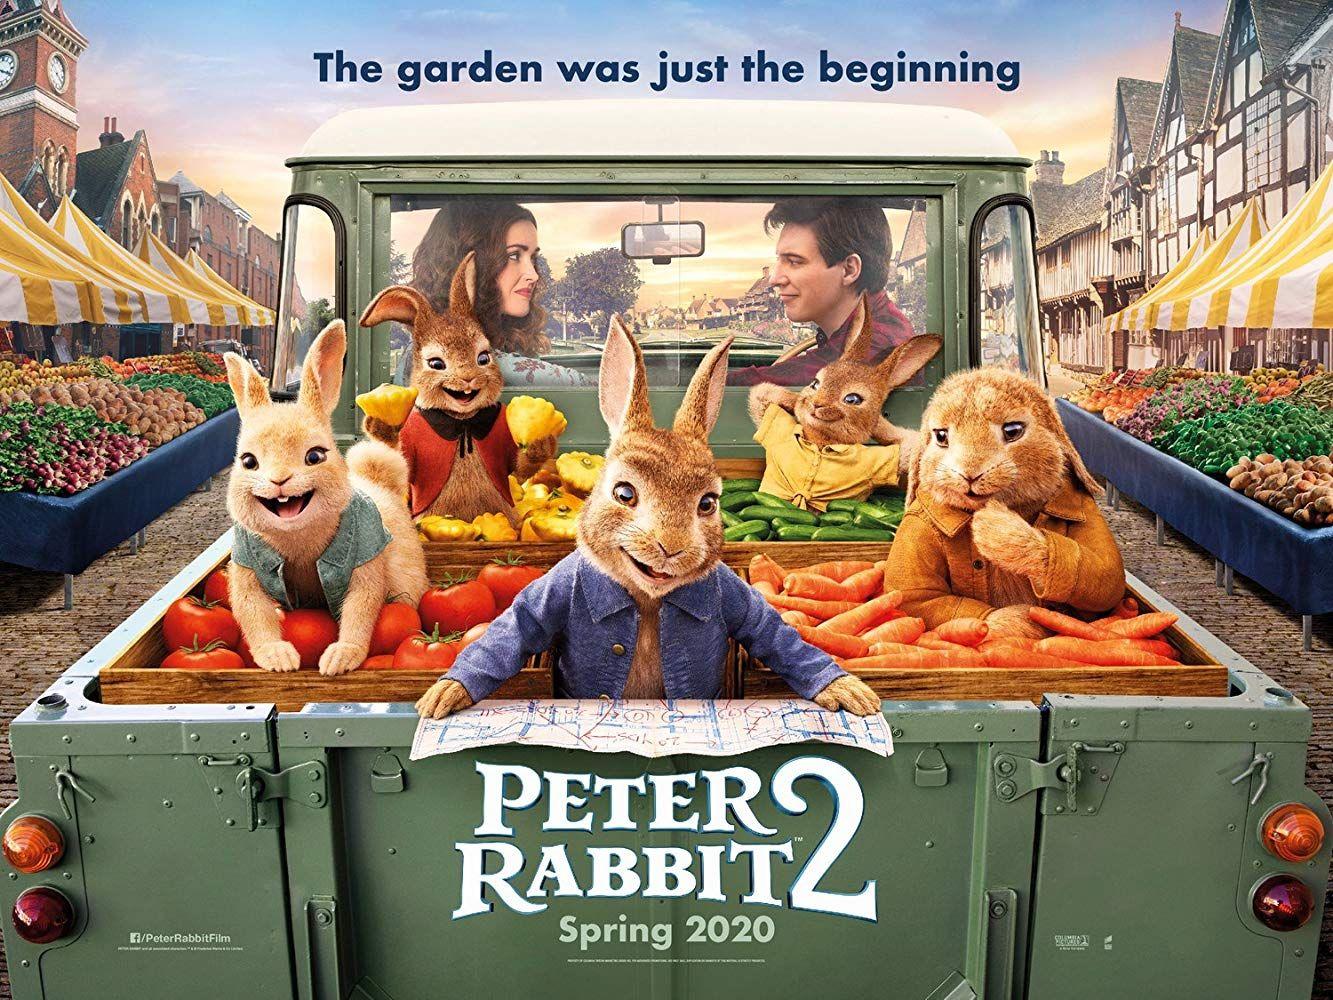 Watch Peter Rabbit 2 The Runaway (2020) HD Quality | Full movies online  free, Peter rabbit, Full movies